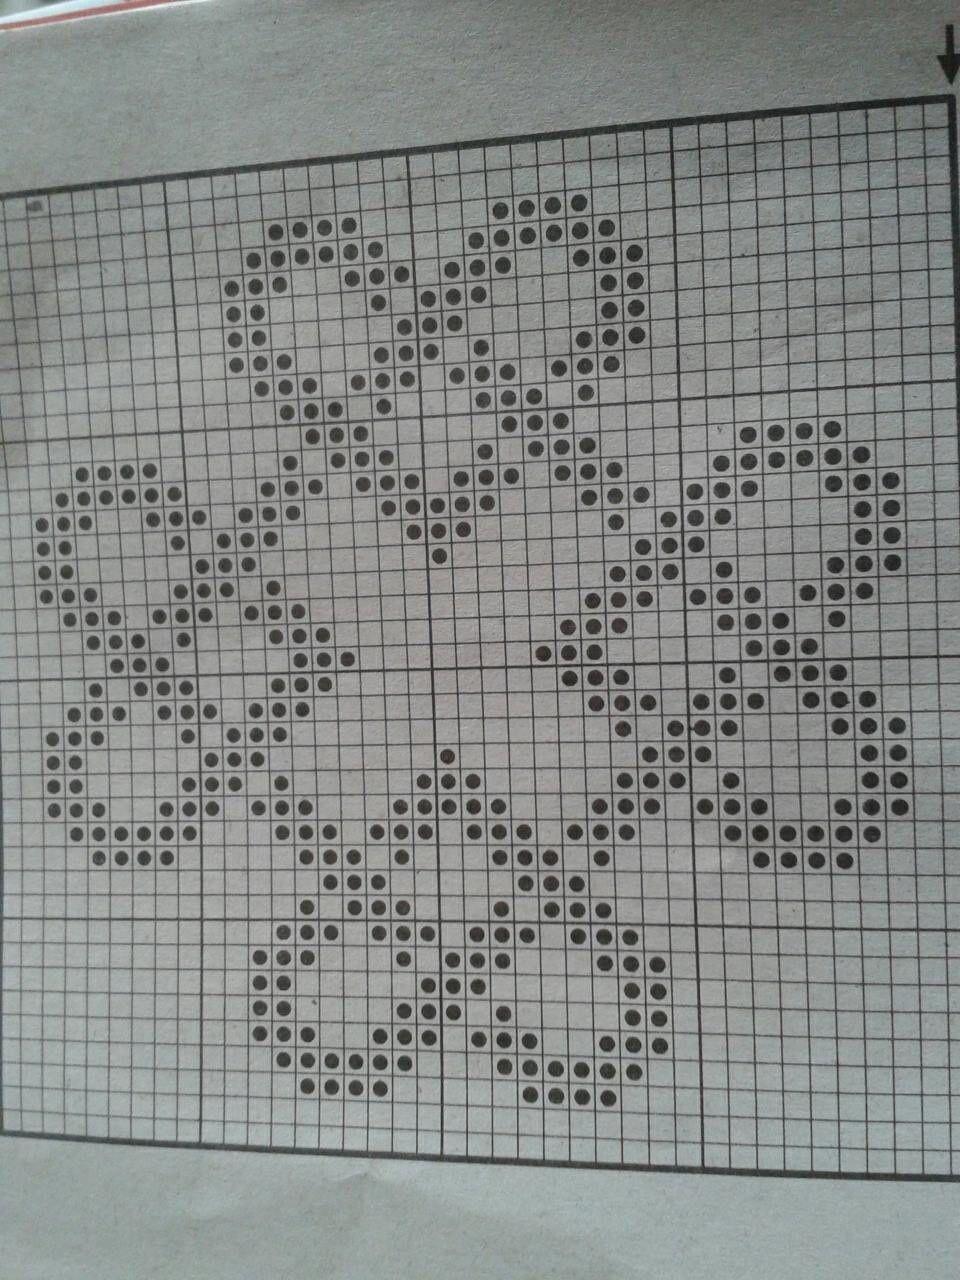 Knitting Heart Chart : Hearts knit fair isle chart free needlepoint